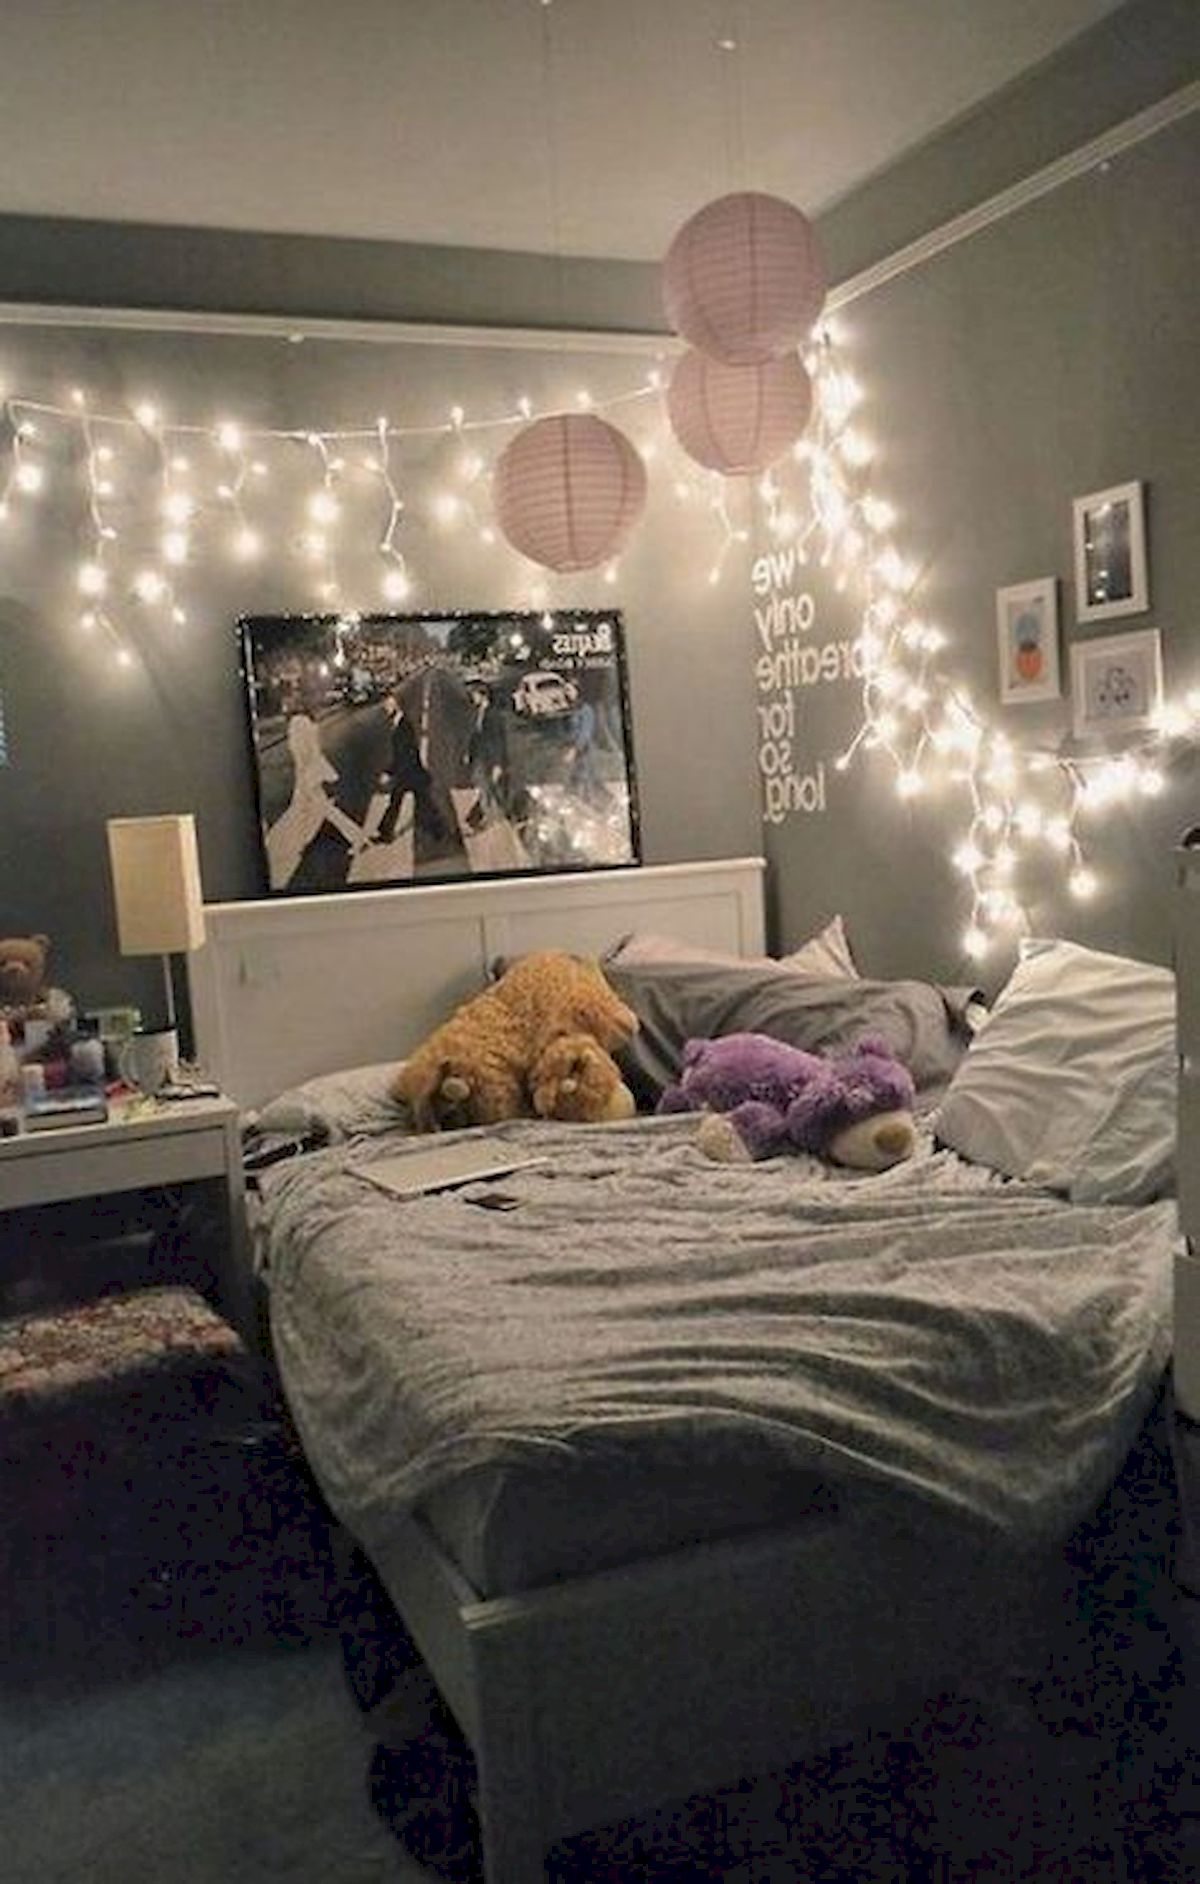 45 Beautiful Bedroom Decor Ideas for Teens (41)